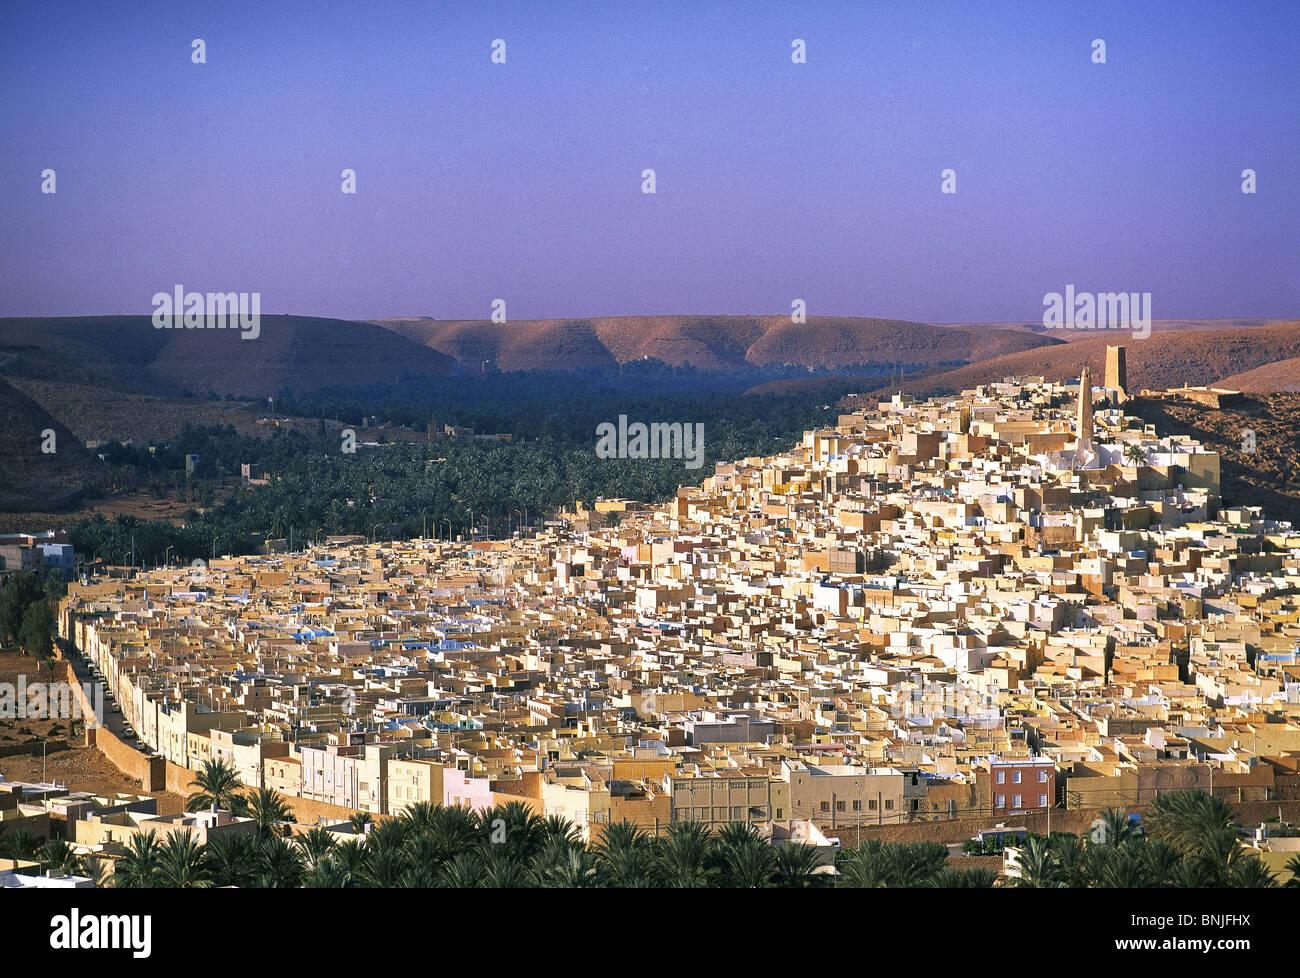 Algeria March 2007 Sahara Grand Erg Occidental Ghardaia city desert city overlook - Stock Image